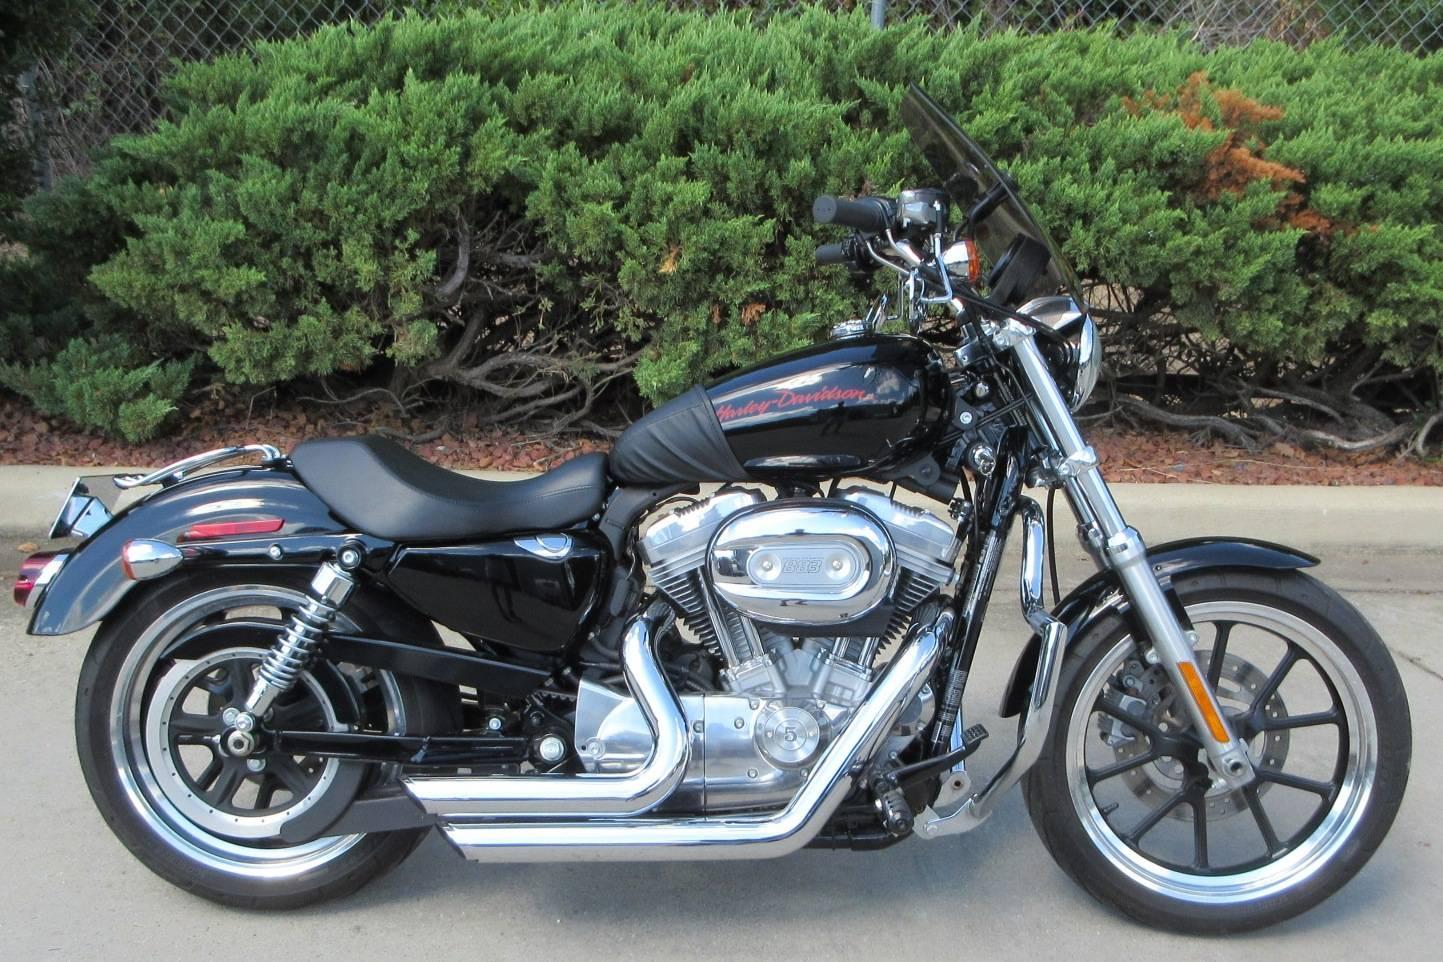 Used 2012 Harley-Davidson Sportster® 883 SuperLow® | Motorcycles in ...